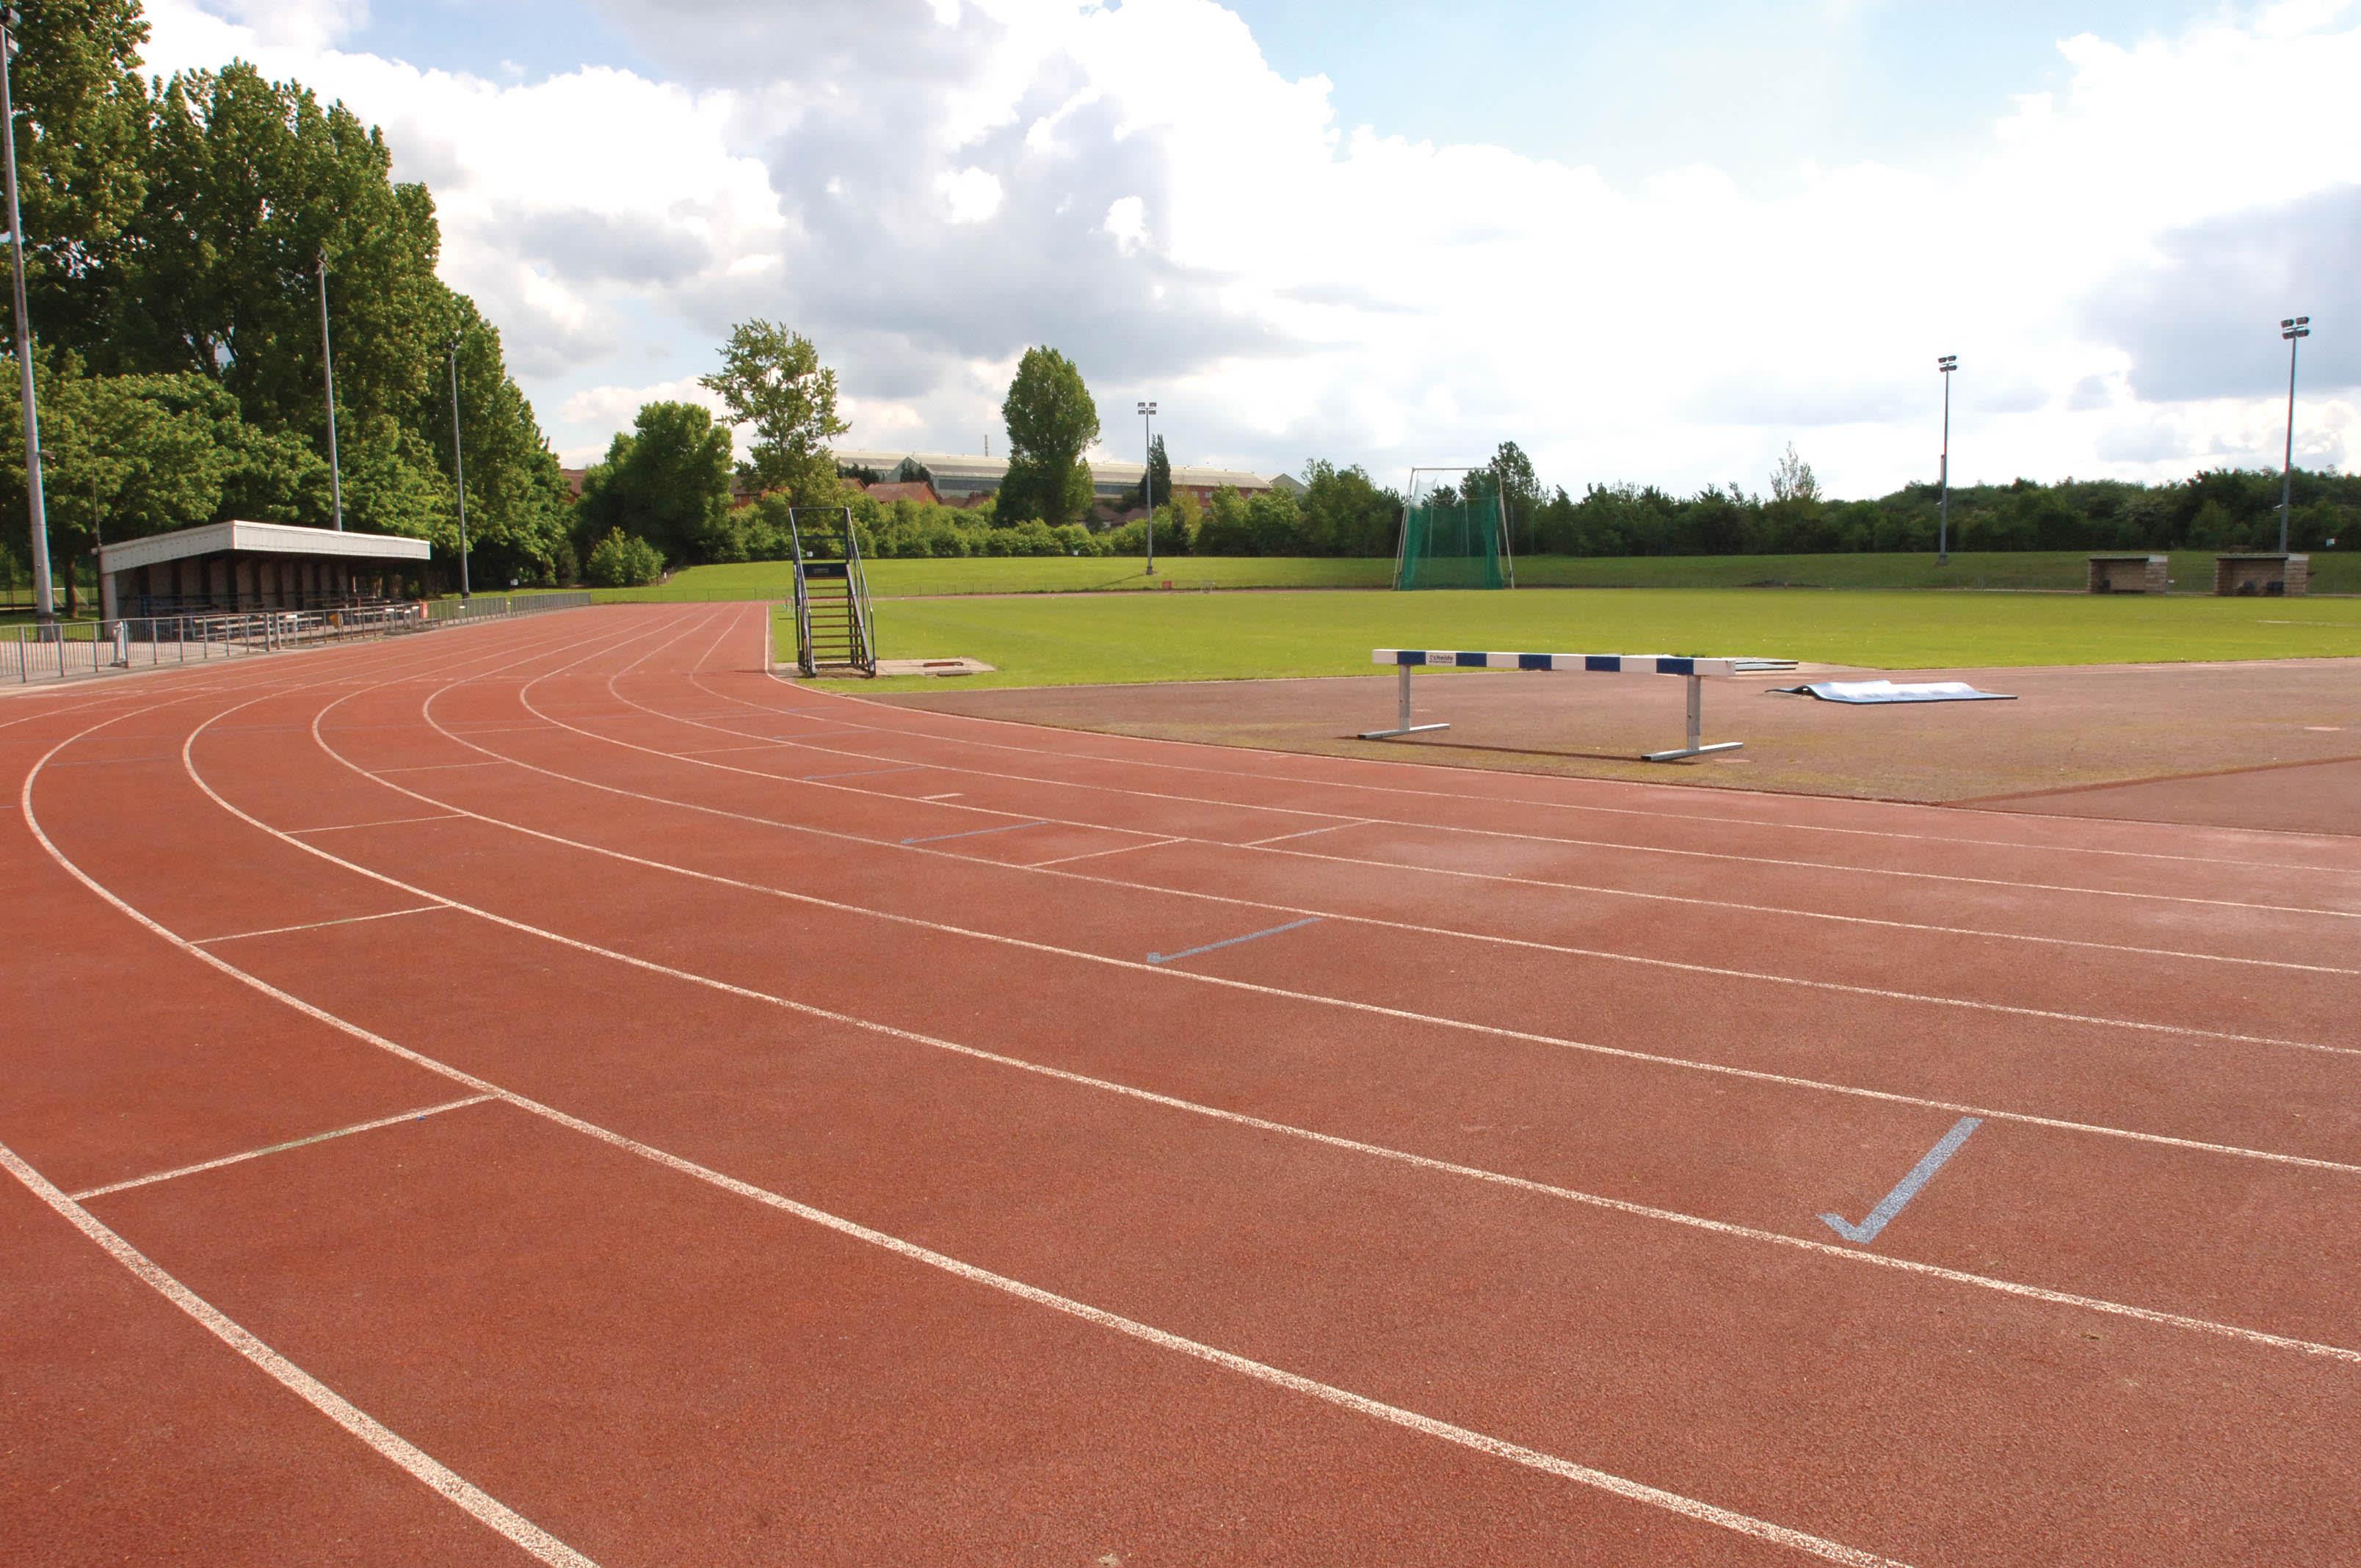 5000m Track Event - October